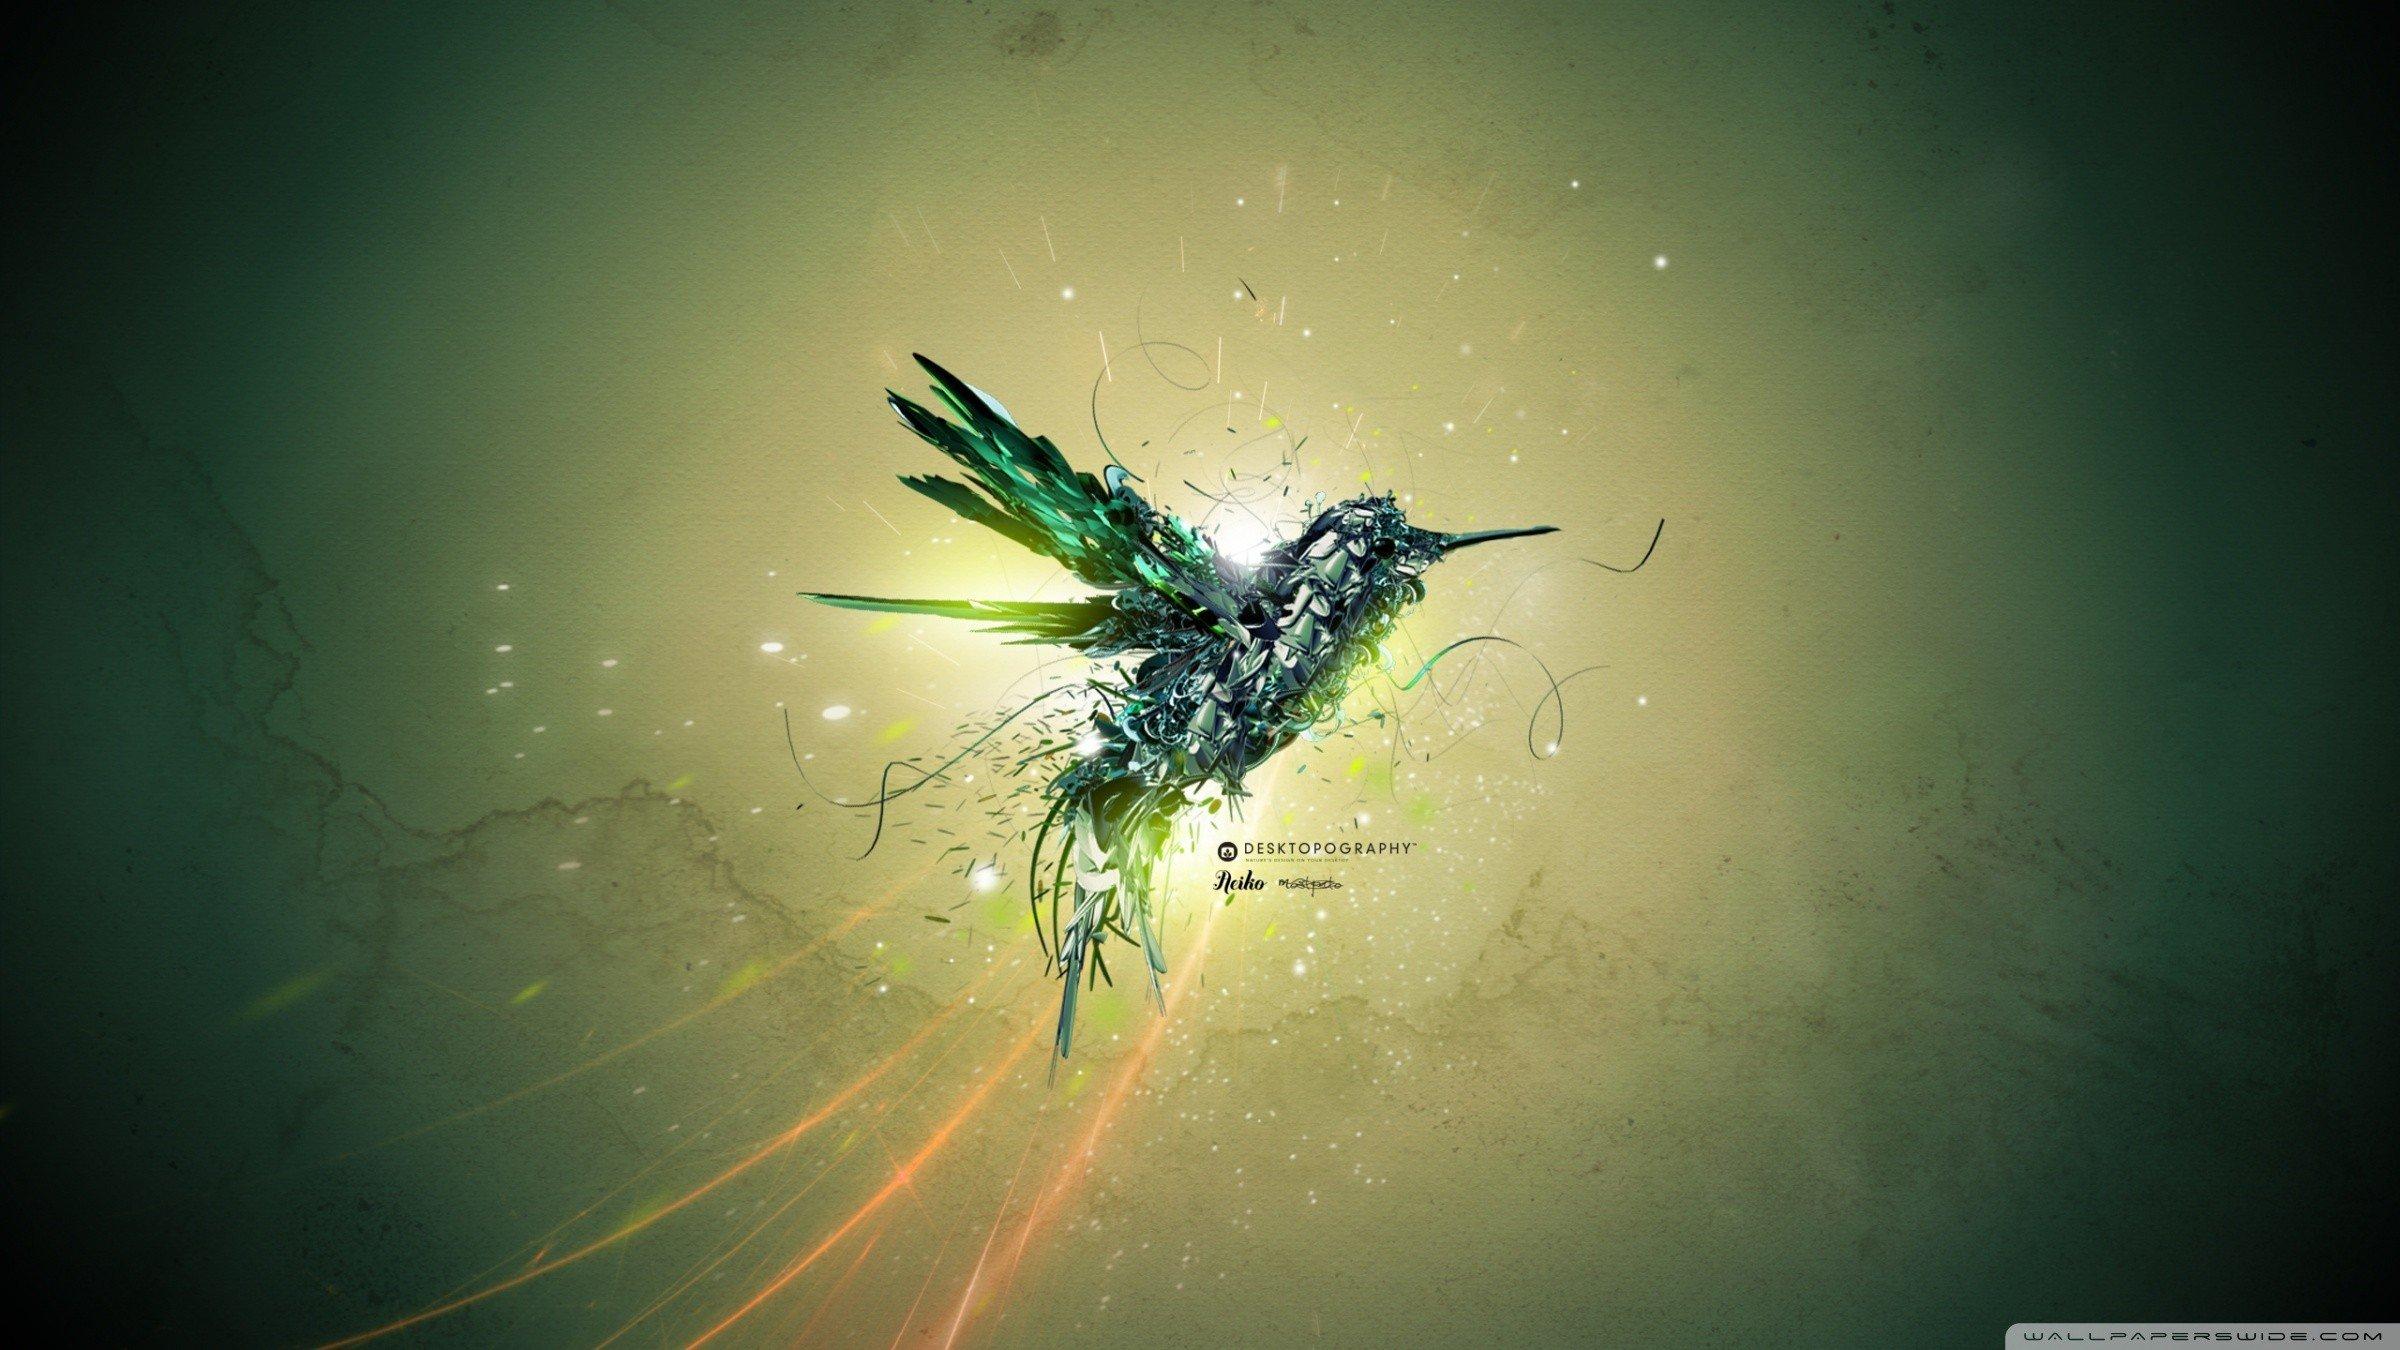 Wallpaper 2400x1350 Px Colibri Bird Desktopography 2400x1350